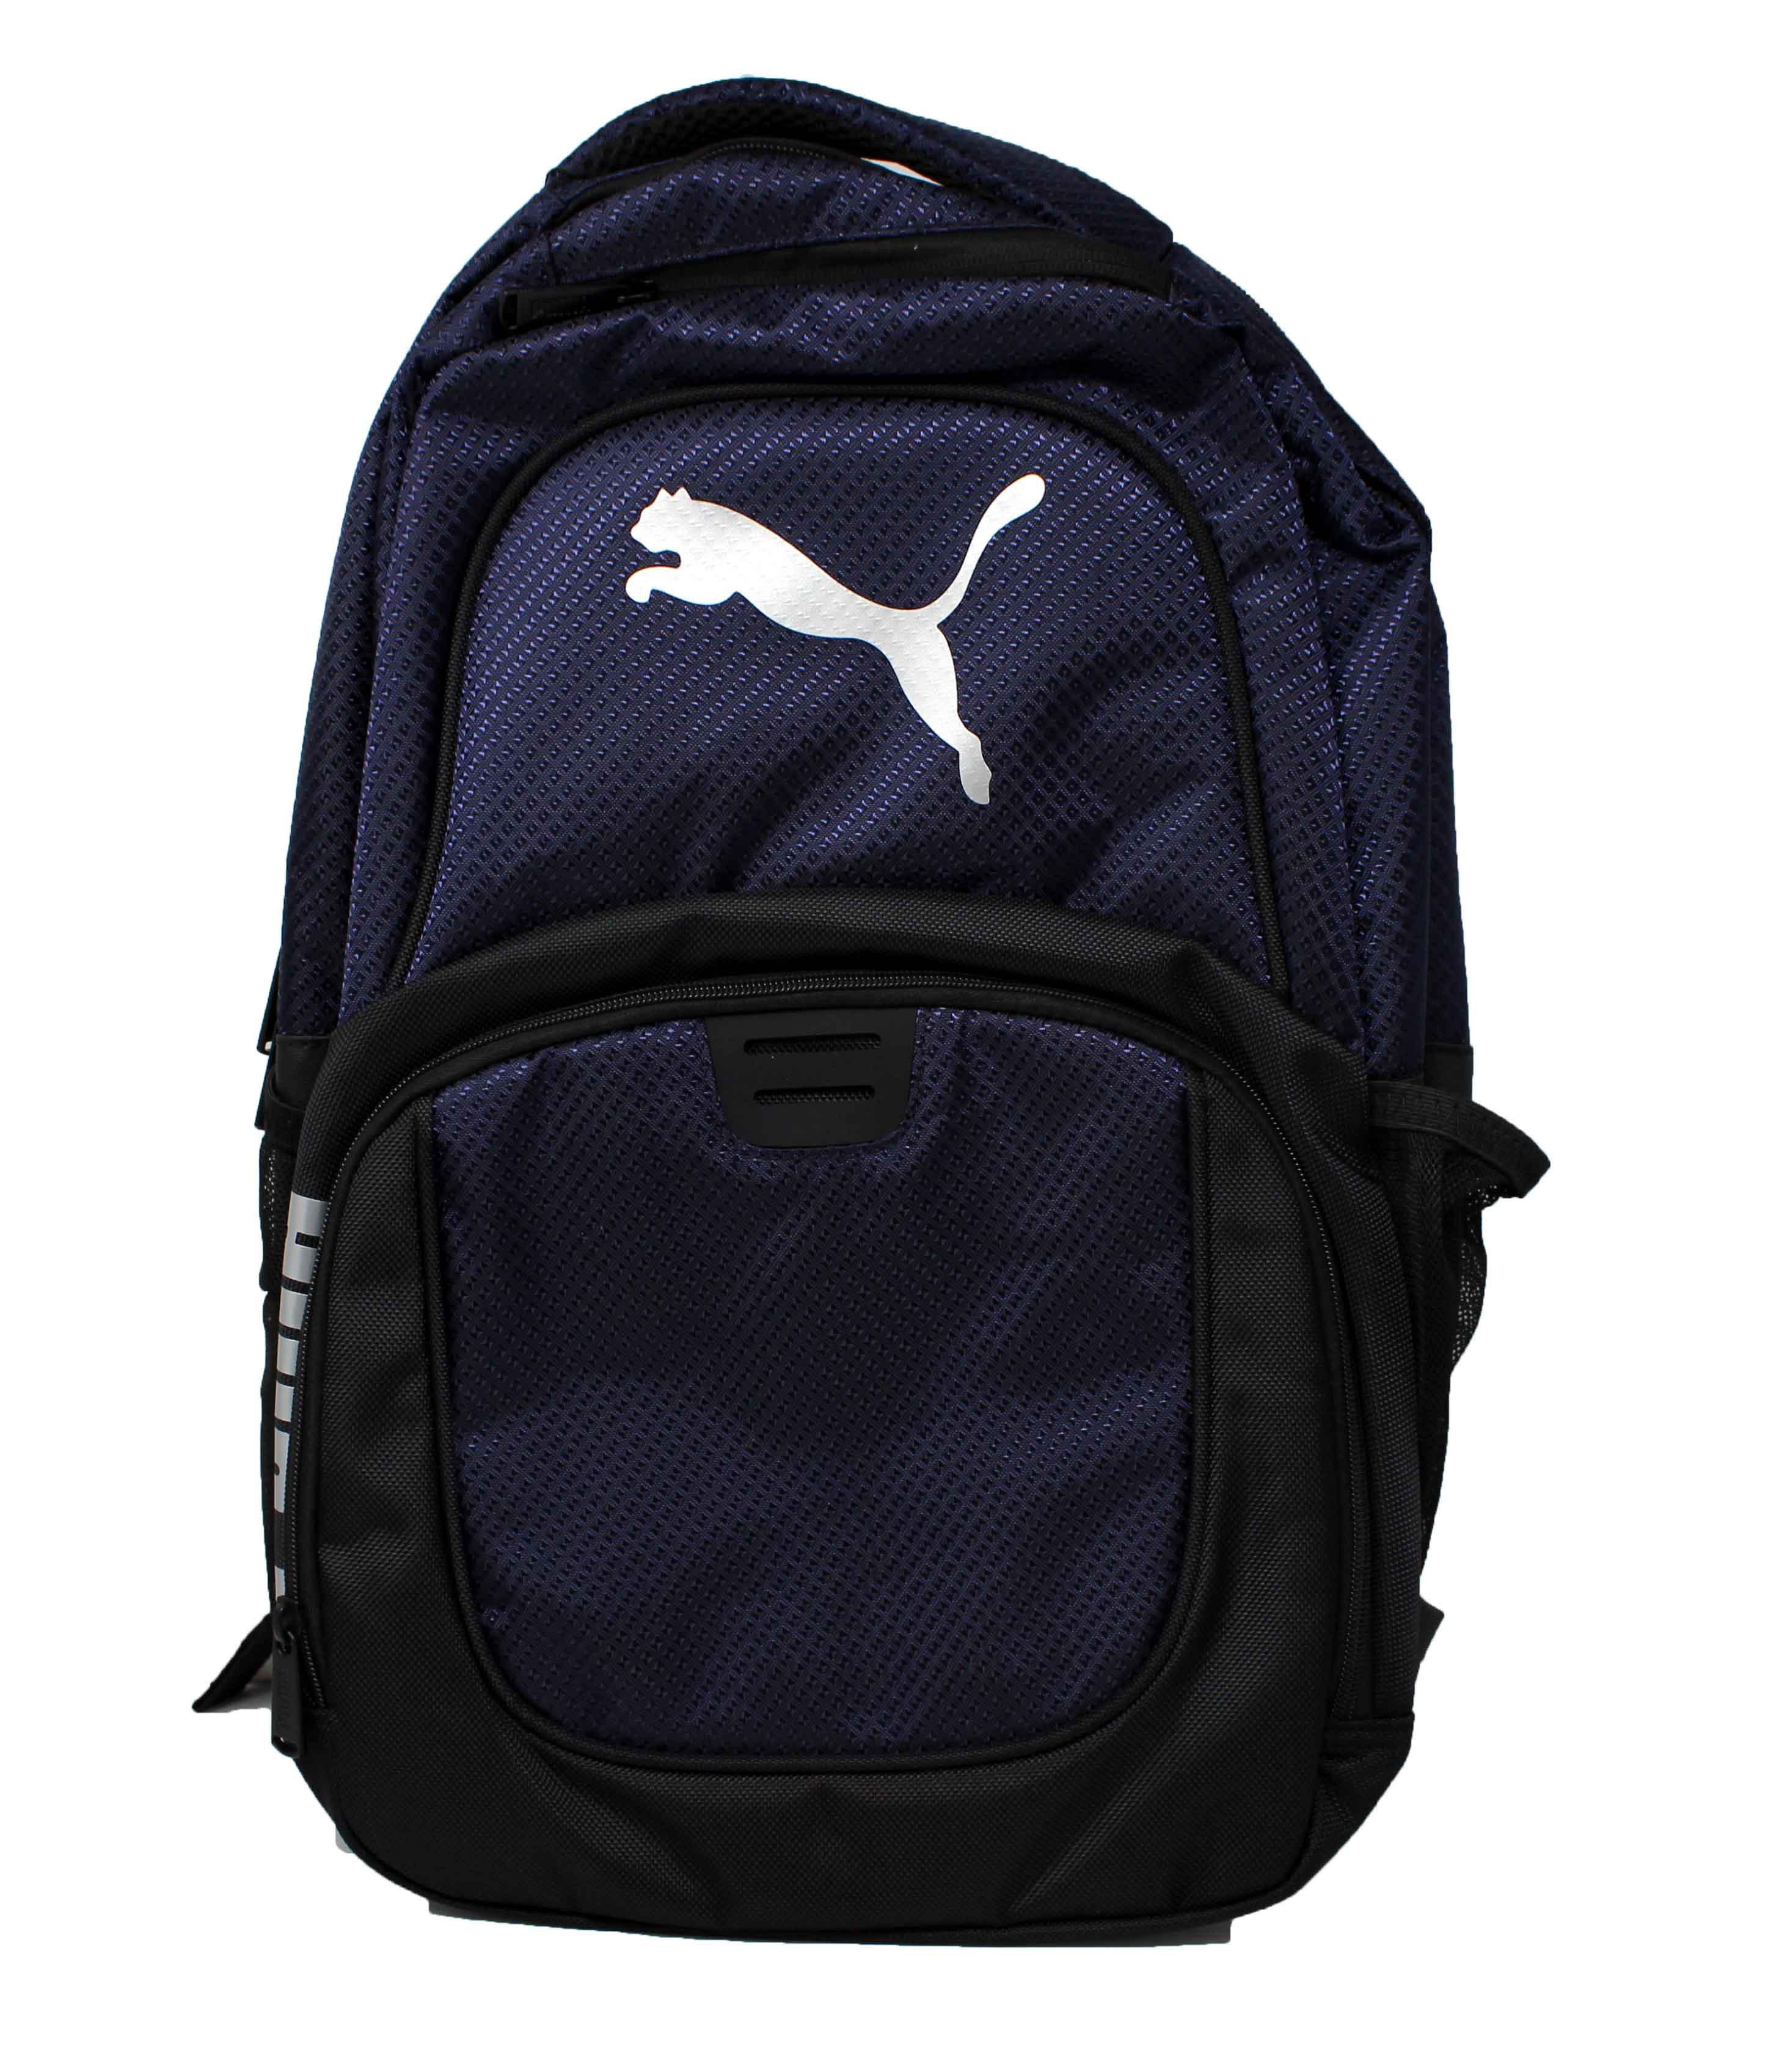 PUMA - Puma Challenger Backpack Blue Navy - Walmart.com